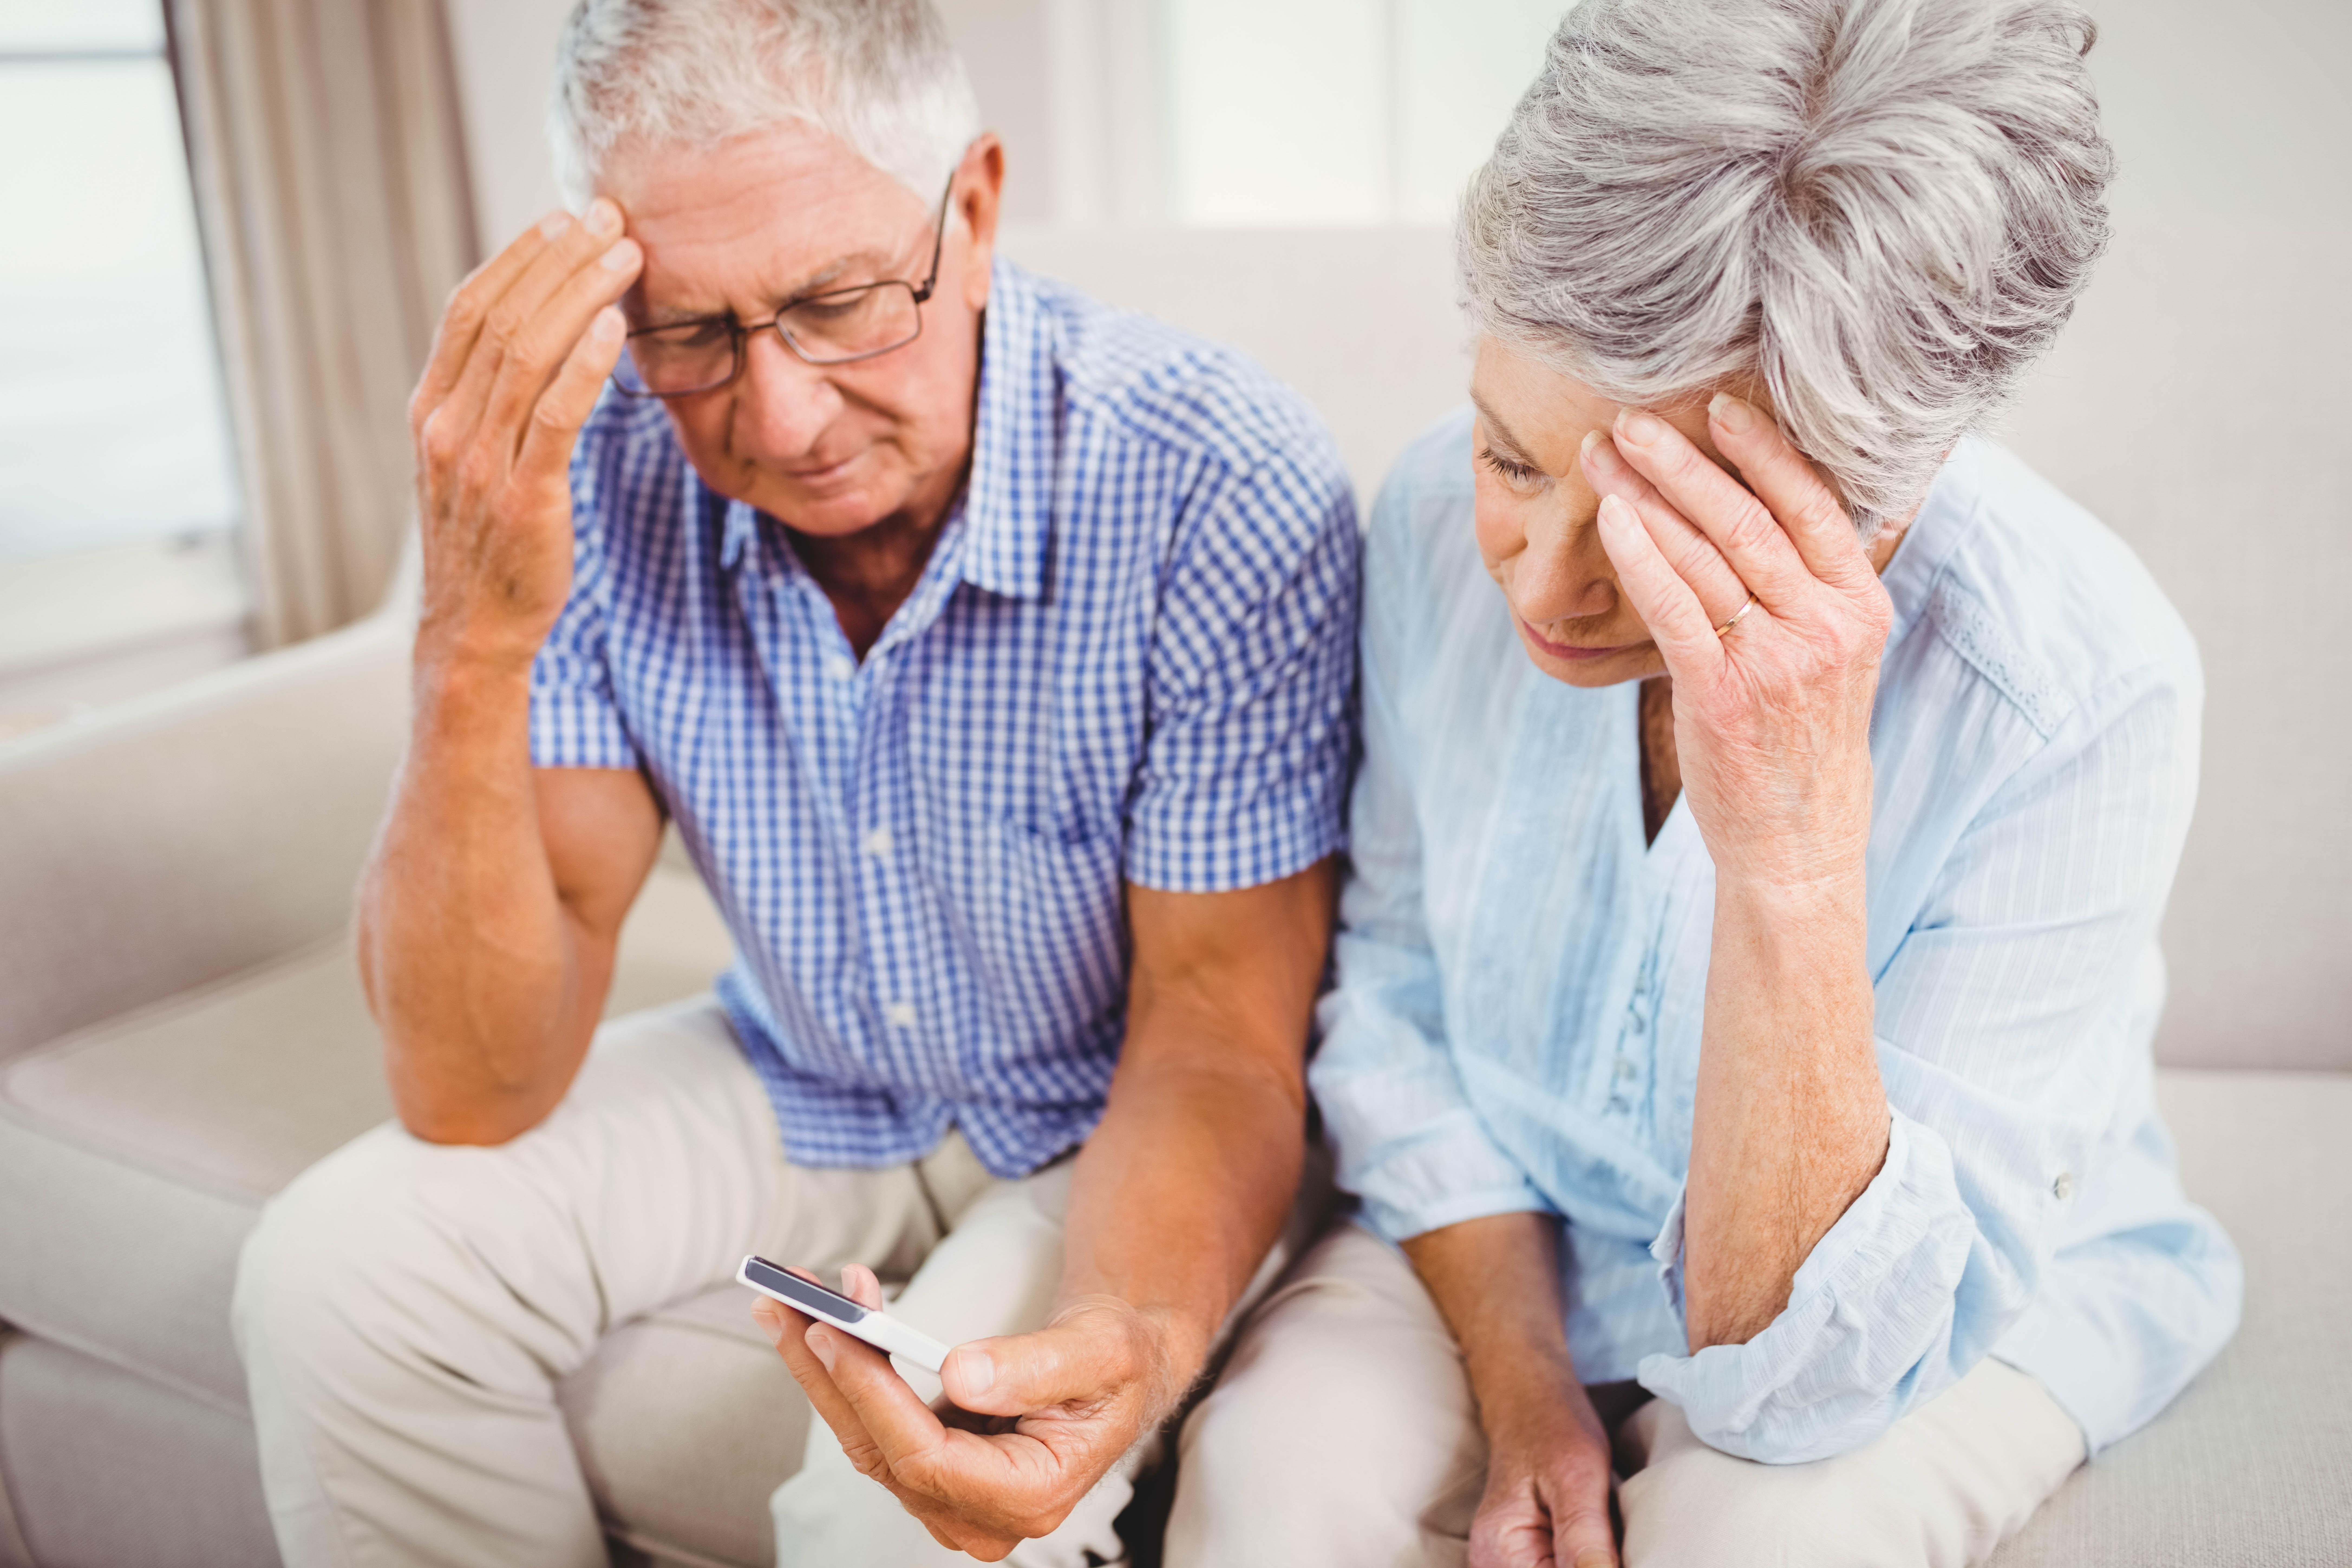 Sad senior couple looking at mobile phone